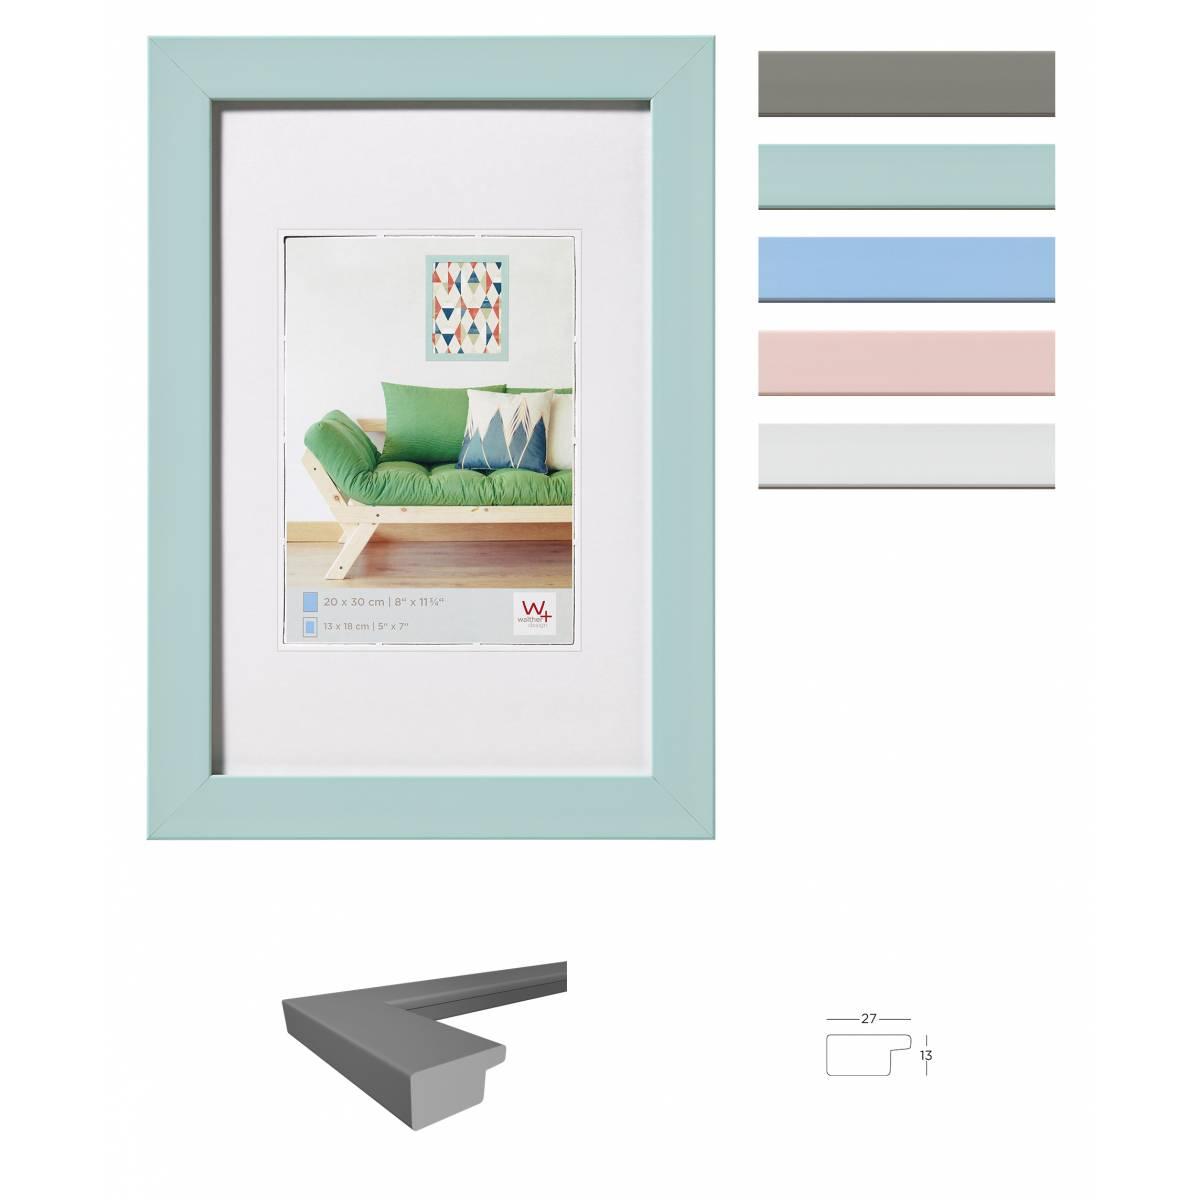 Rahmen Homeliness 10x15 Bis 30x40 In Verschiedenen Farben